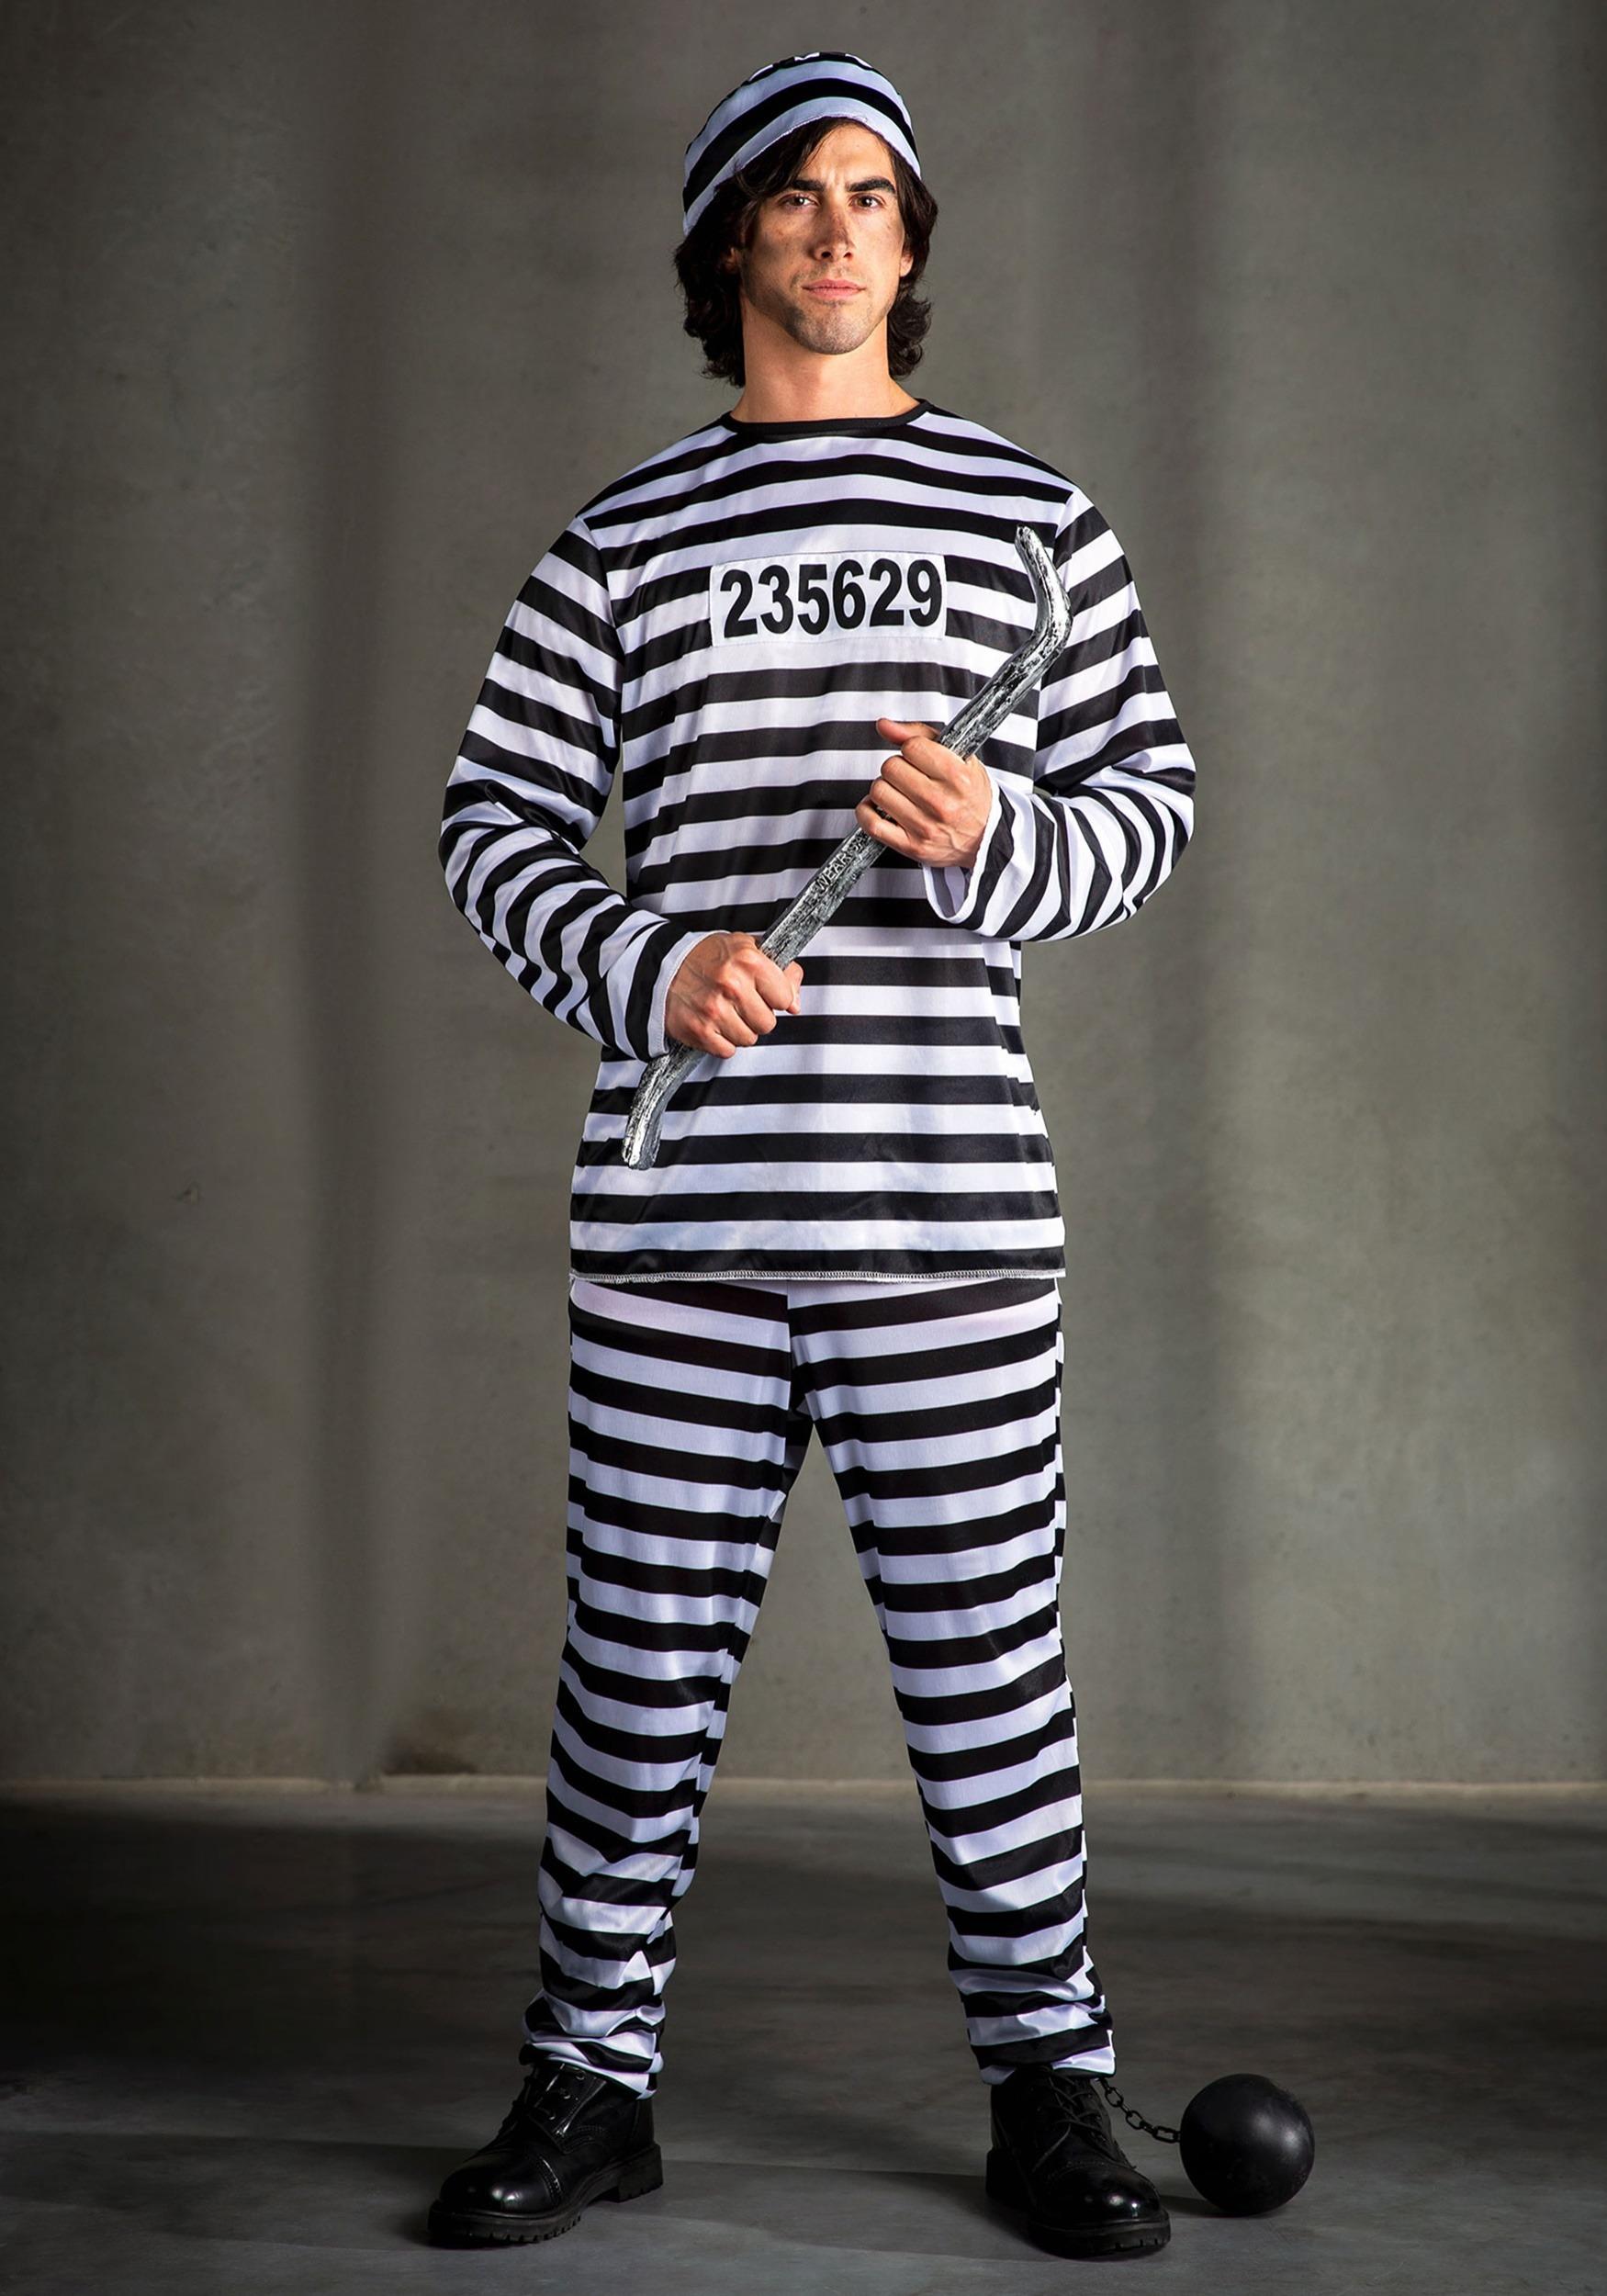 Inmate Halloween Costumes